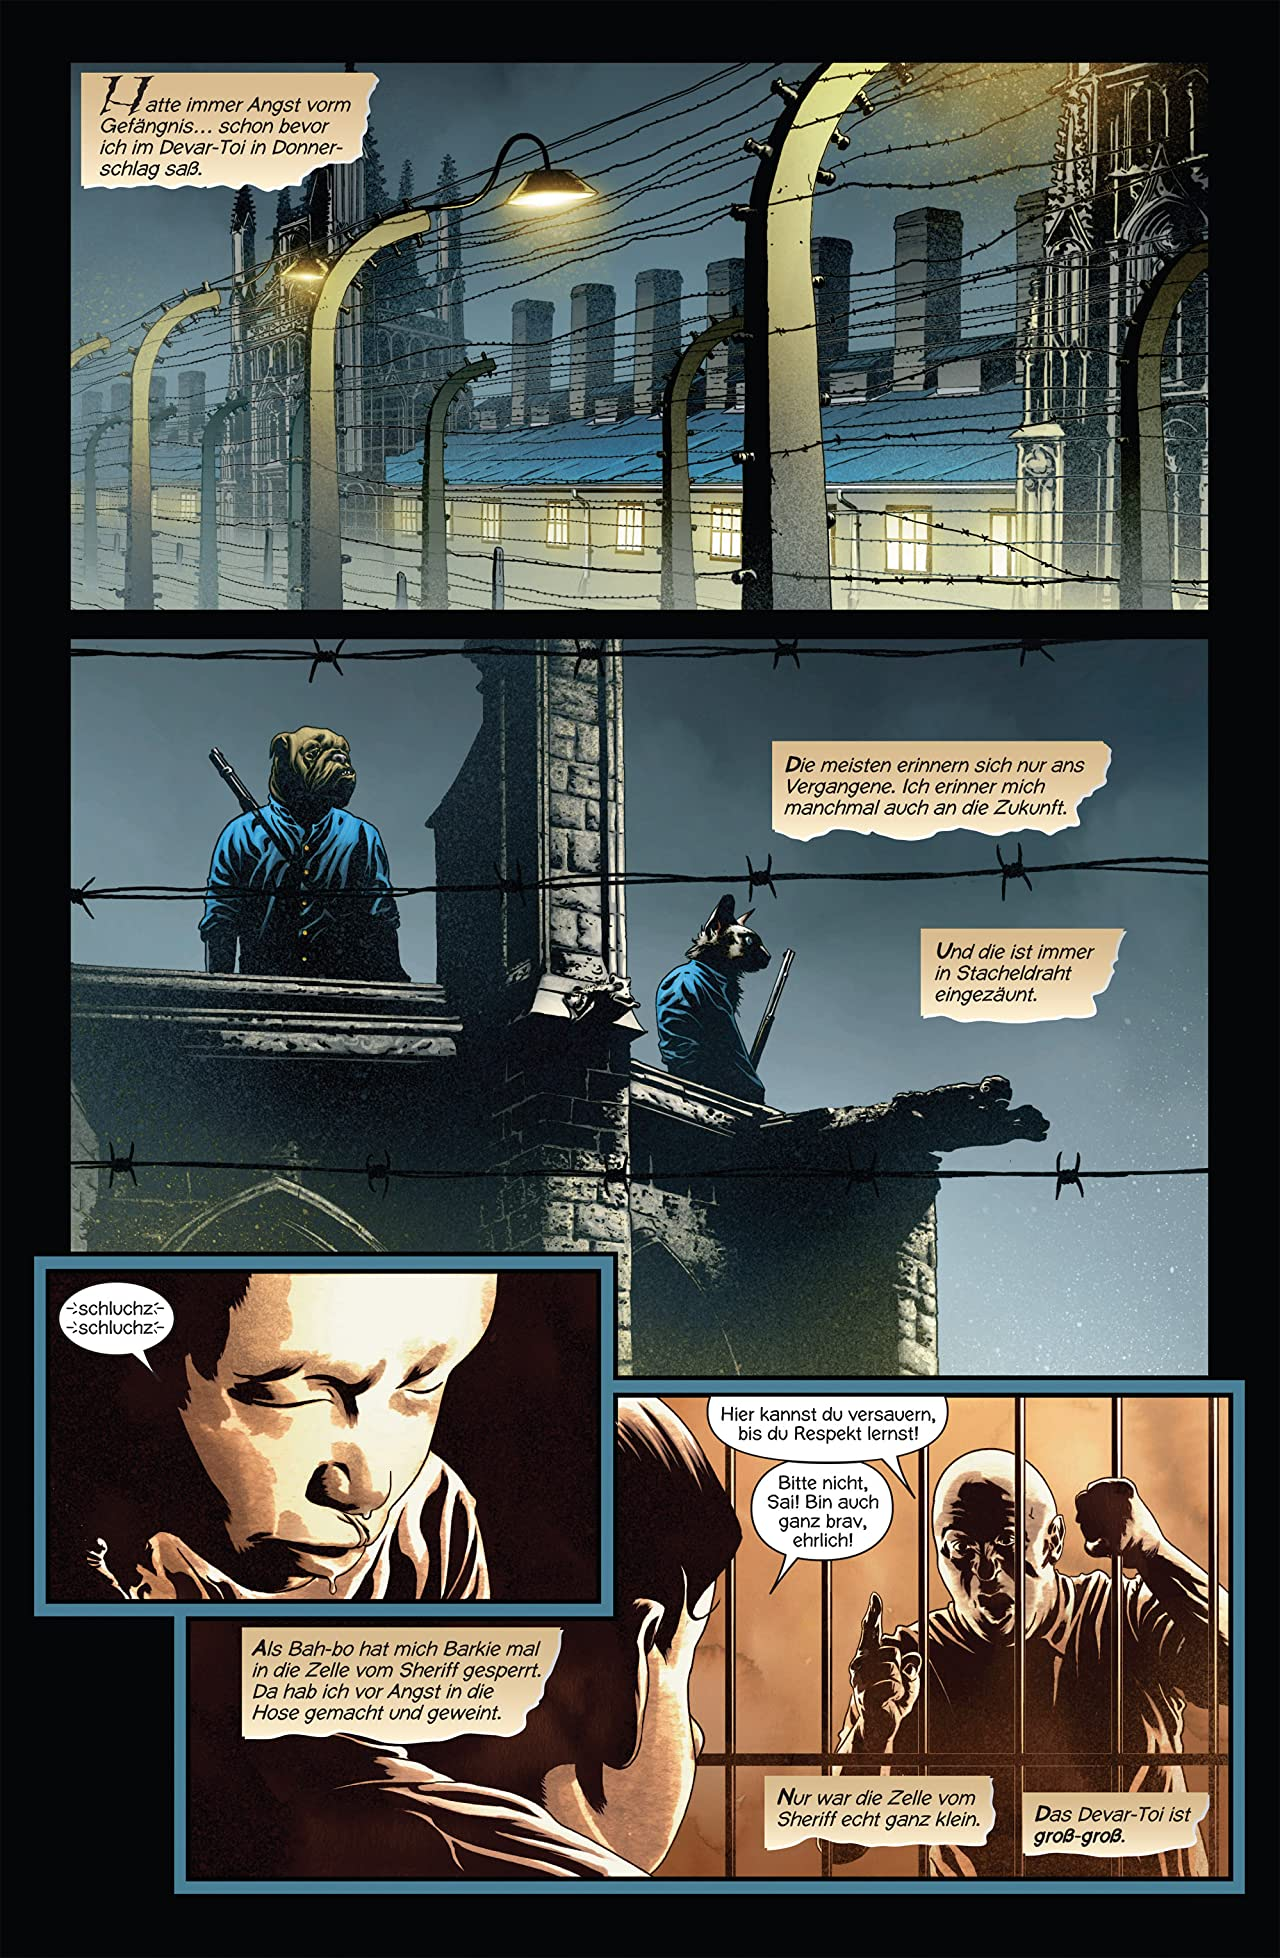 Stephen King's Der Dunkle Turm Vol. 11: Last Shots